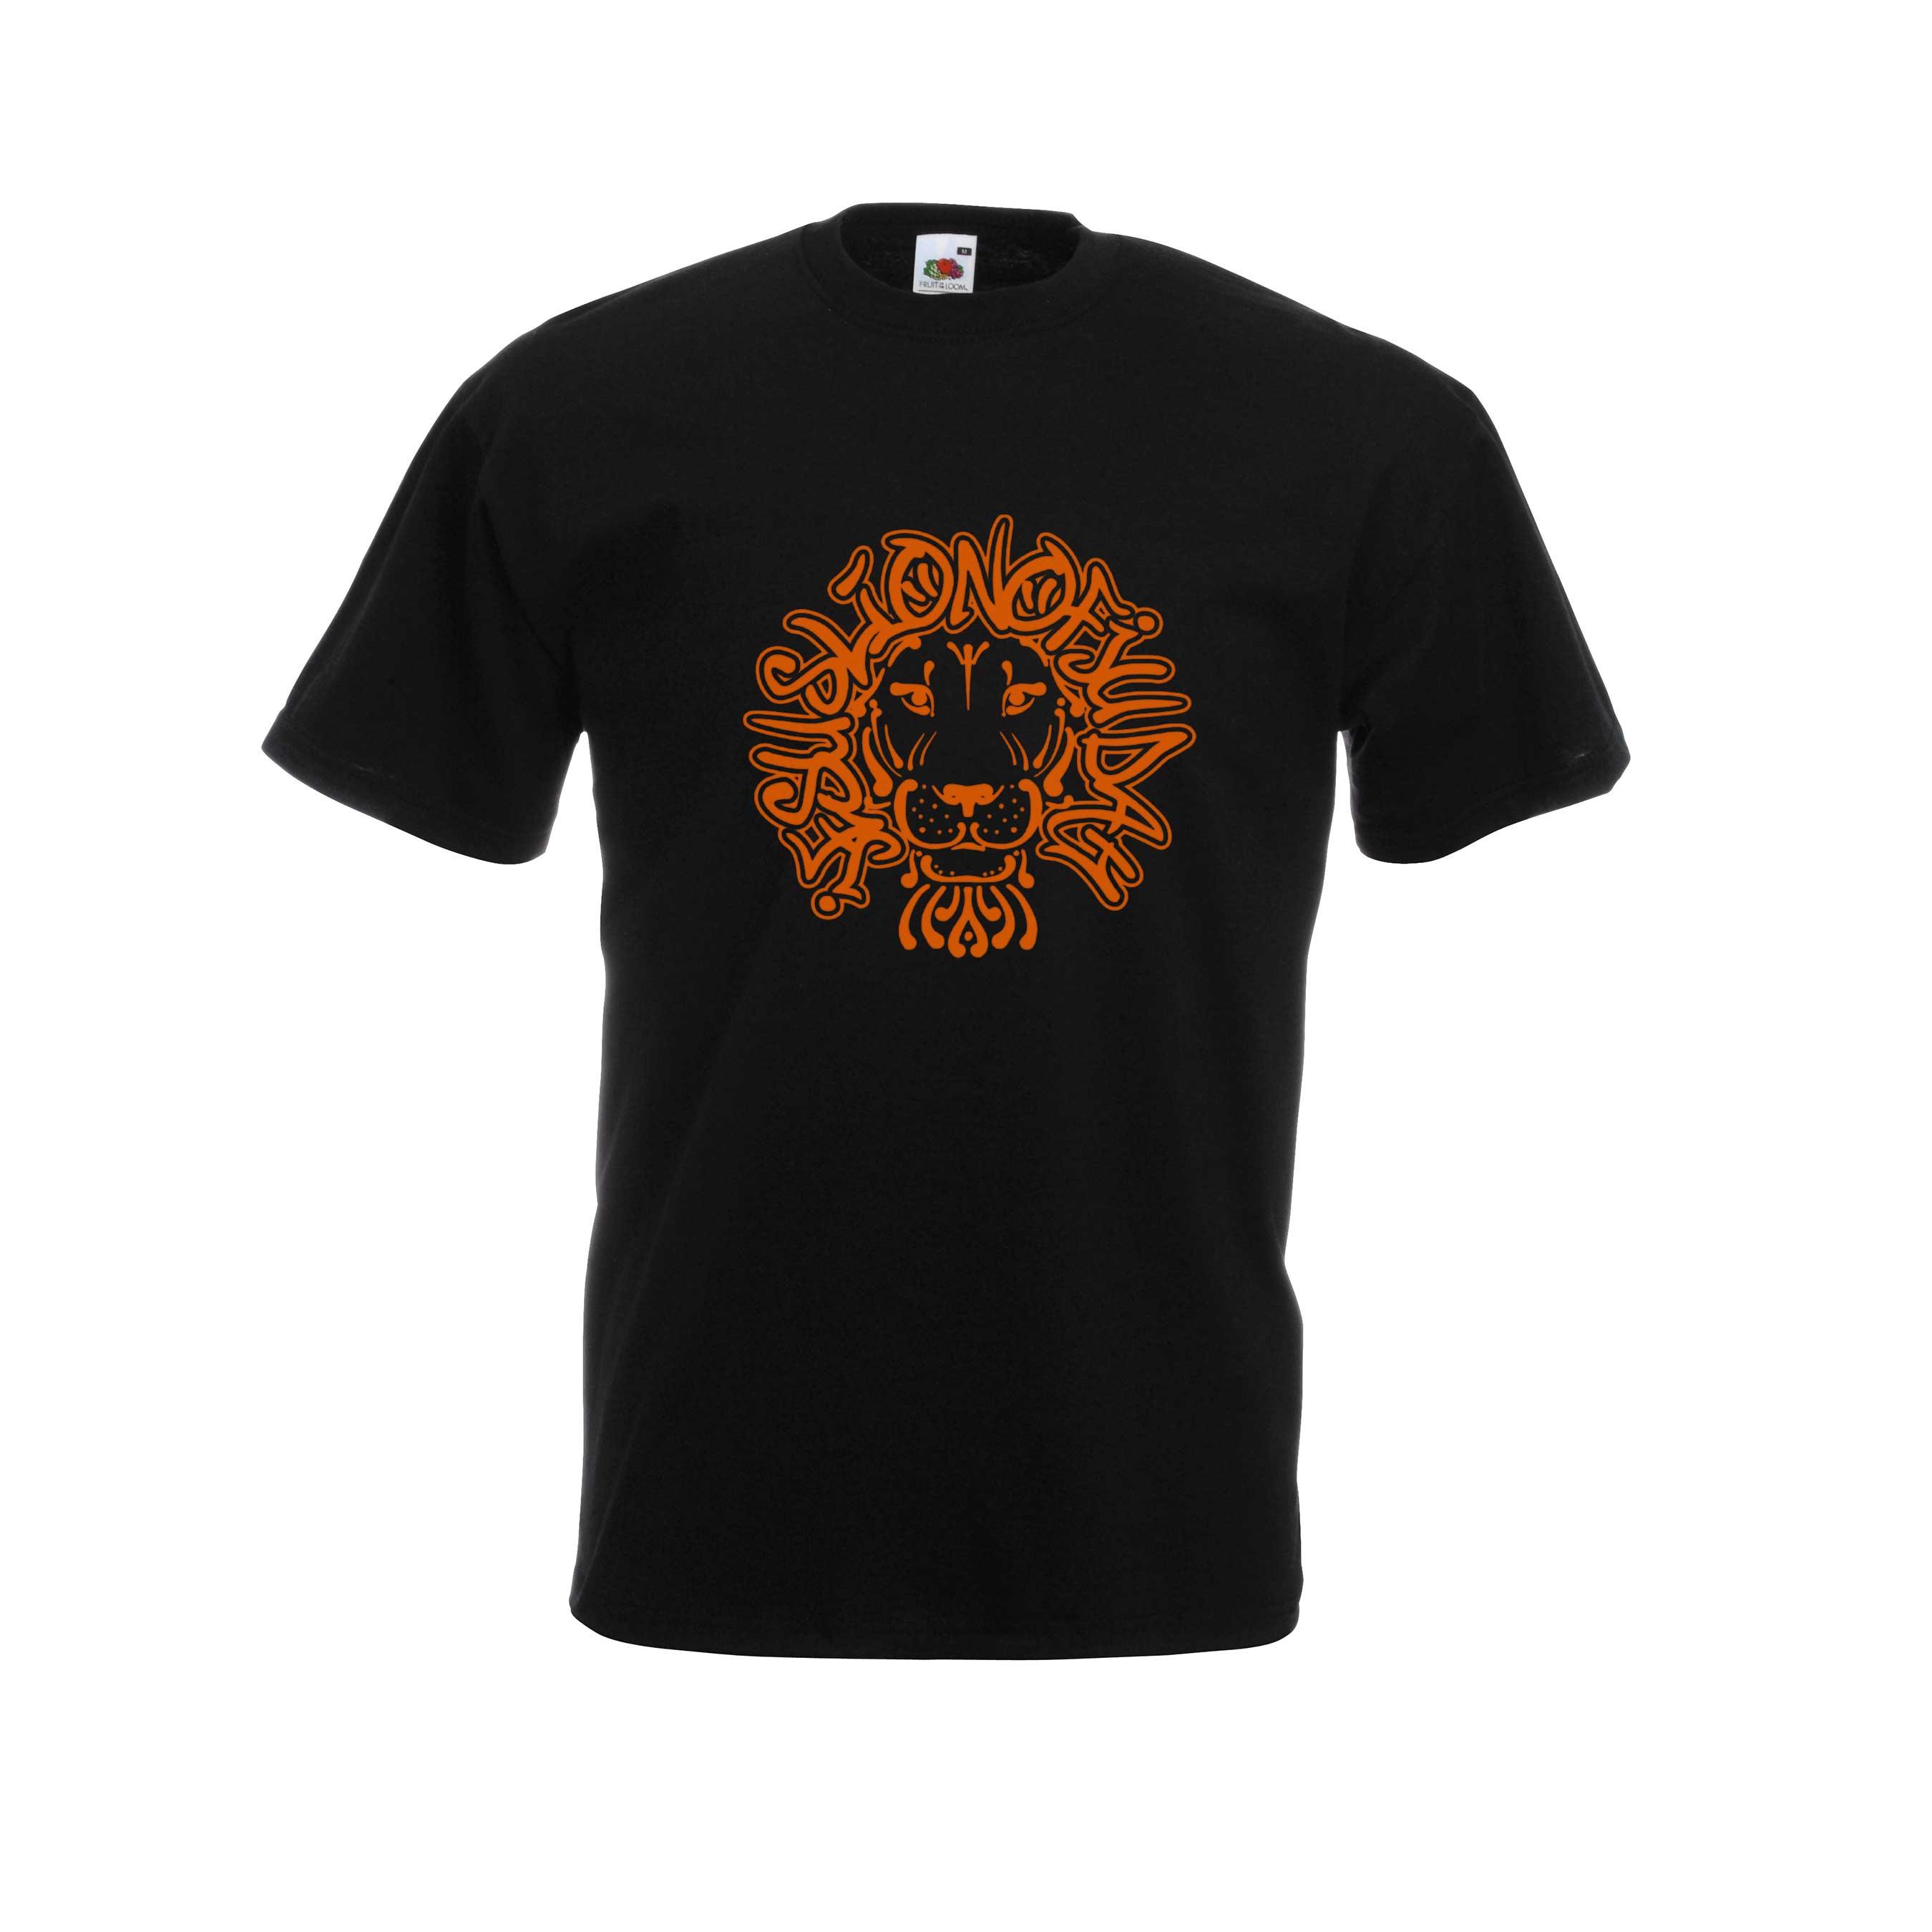 Lion Of Judah design for t-shirt, hoodie & sweatshirt